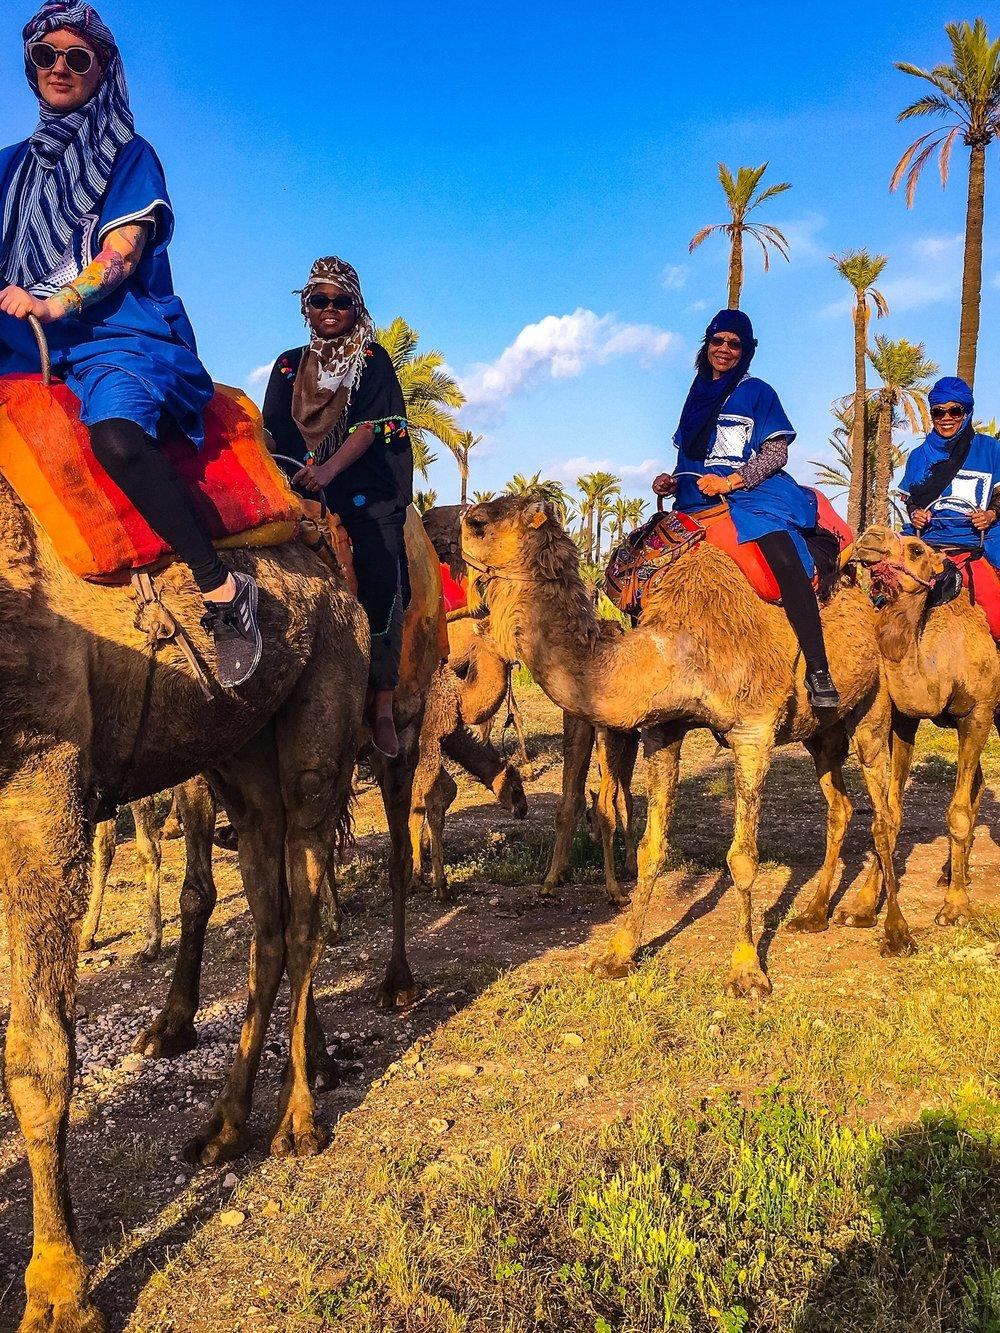 Morocco - FEBRUARY 16 - 23, 2019